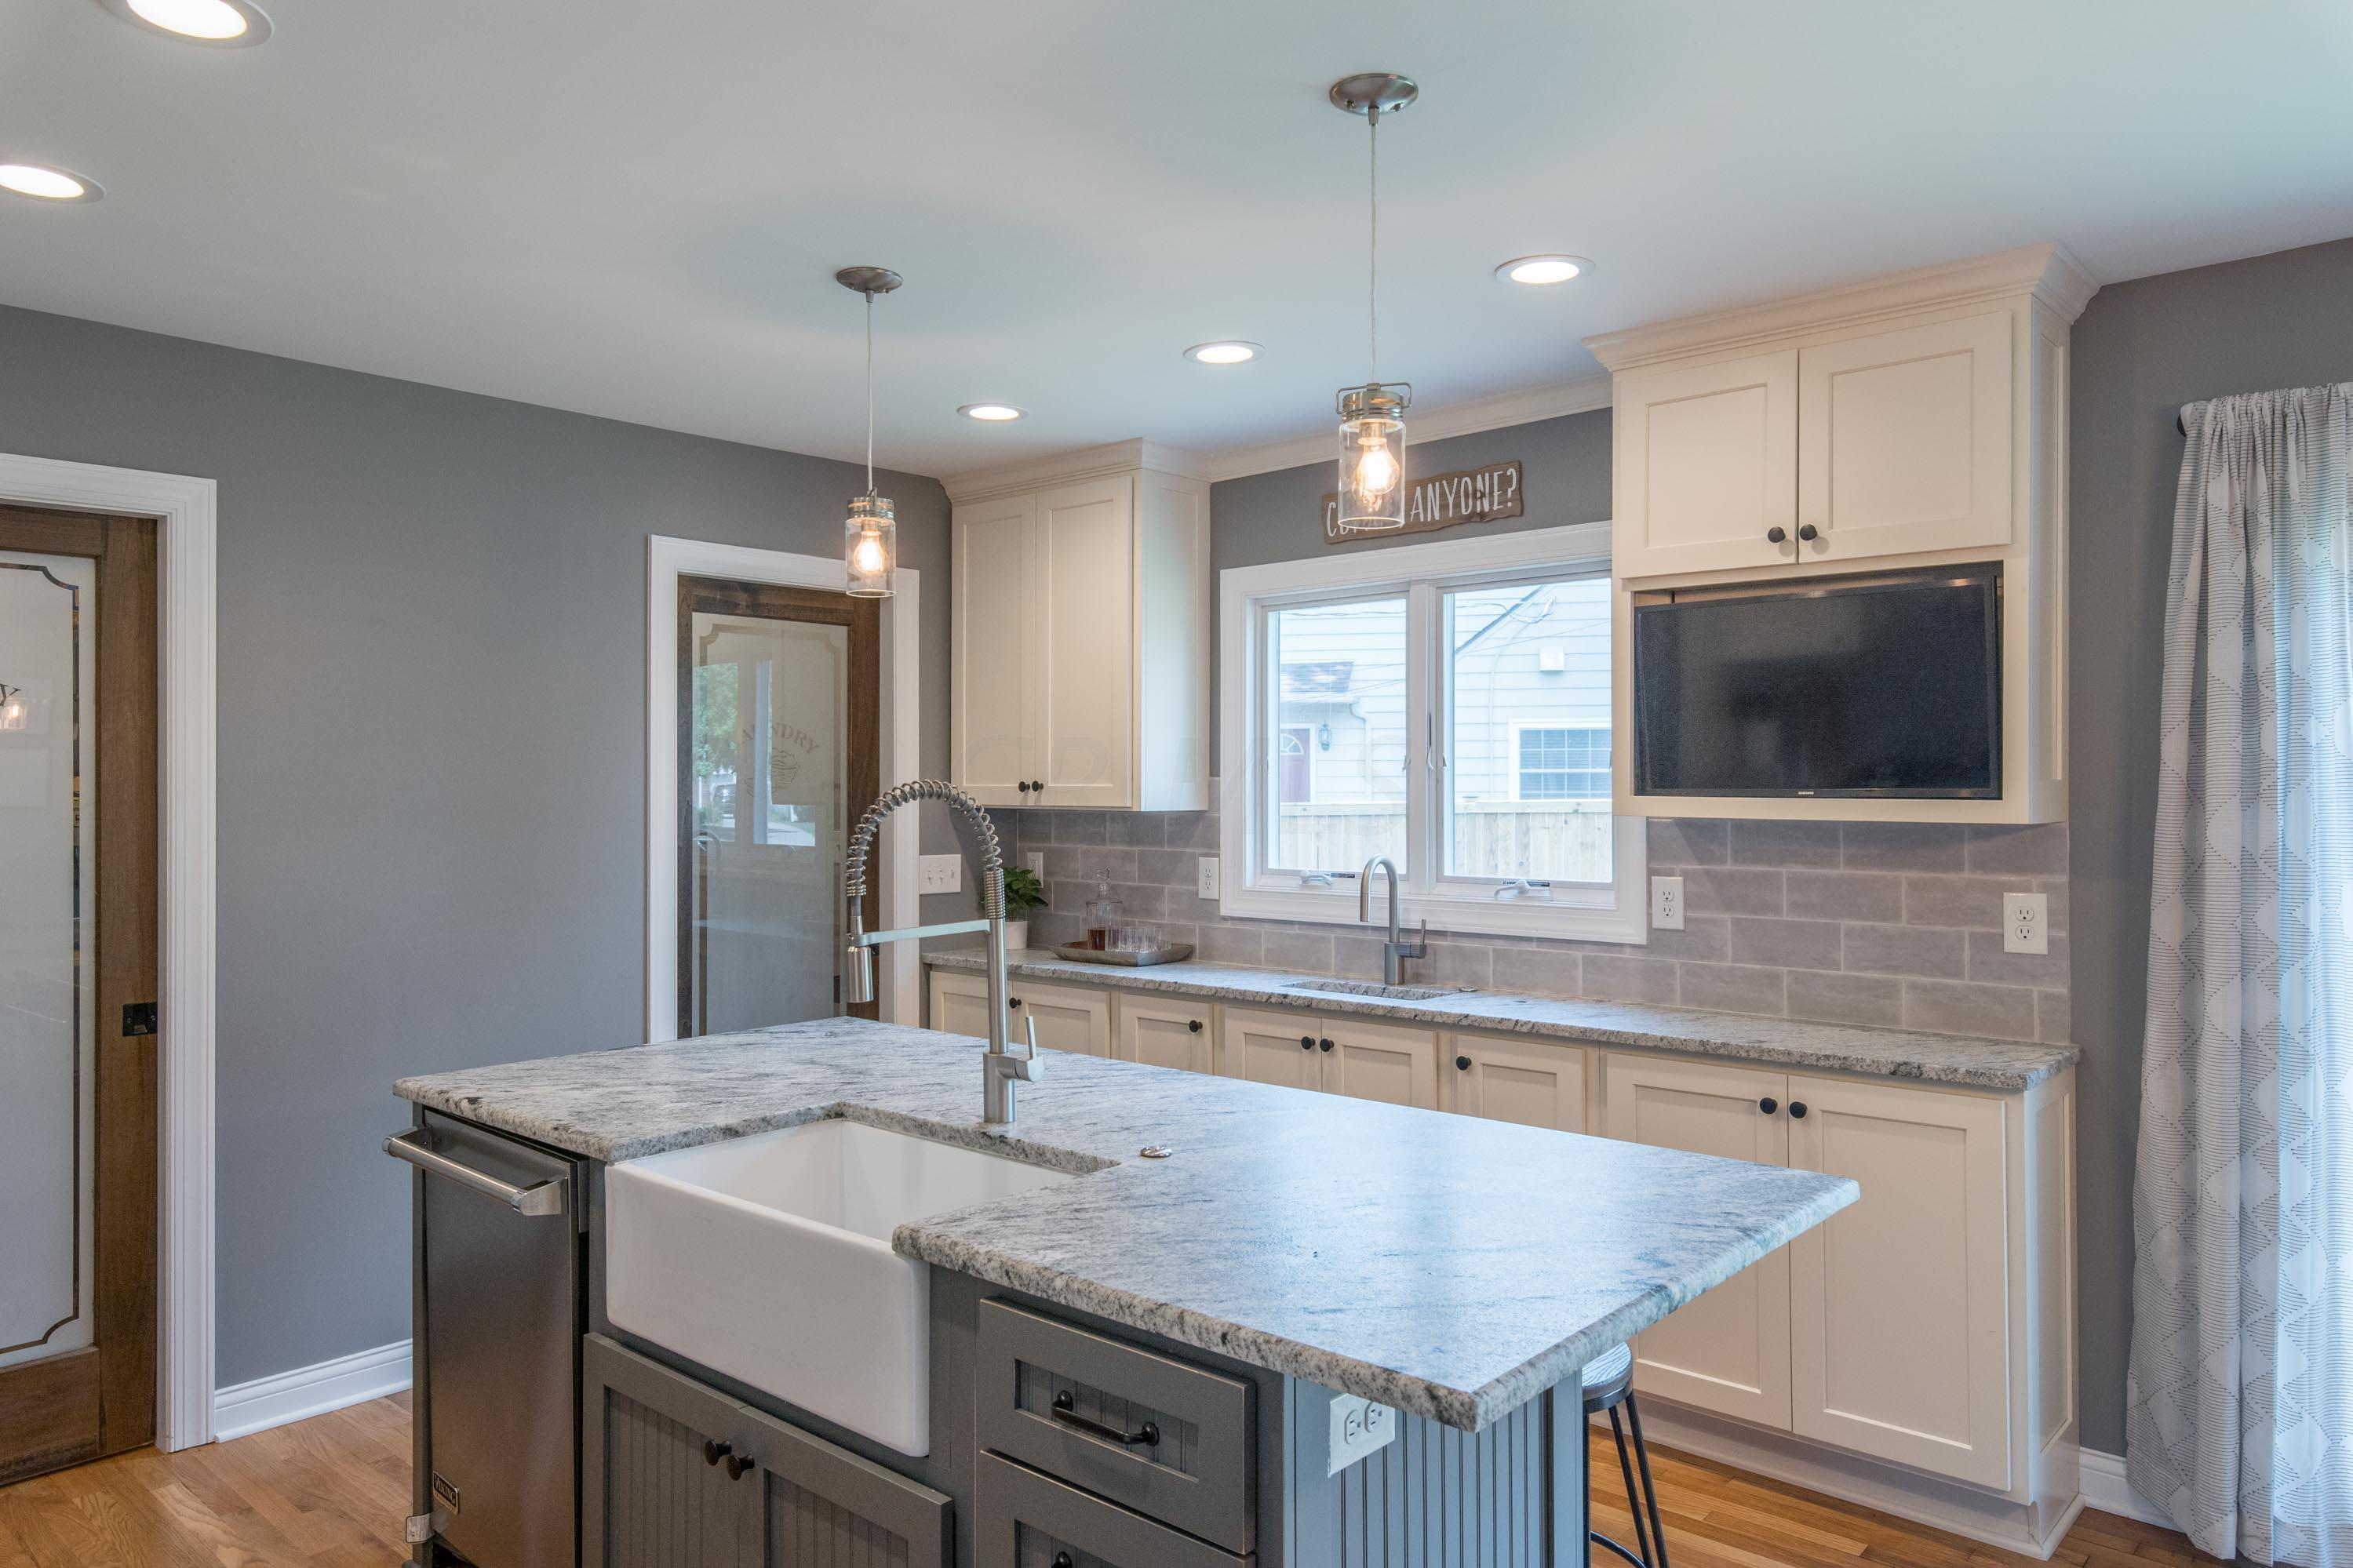 3055 Tremont Road, Upper Arlington, Ohio 43221, 5 Bedrooms Bedrooms, ,2 BathroomsBathrooms,Residential,For Sale,Tremont,220024974